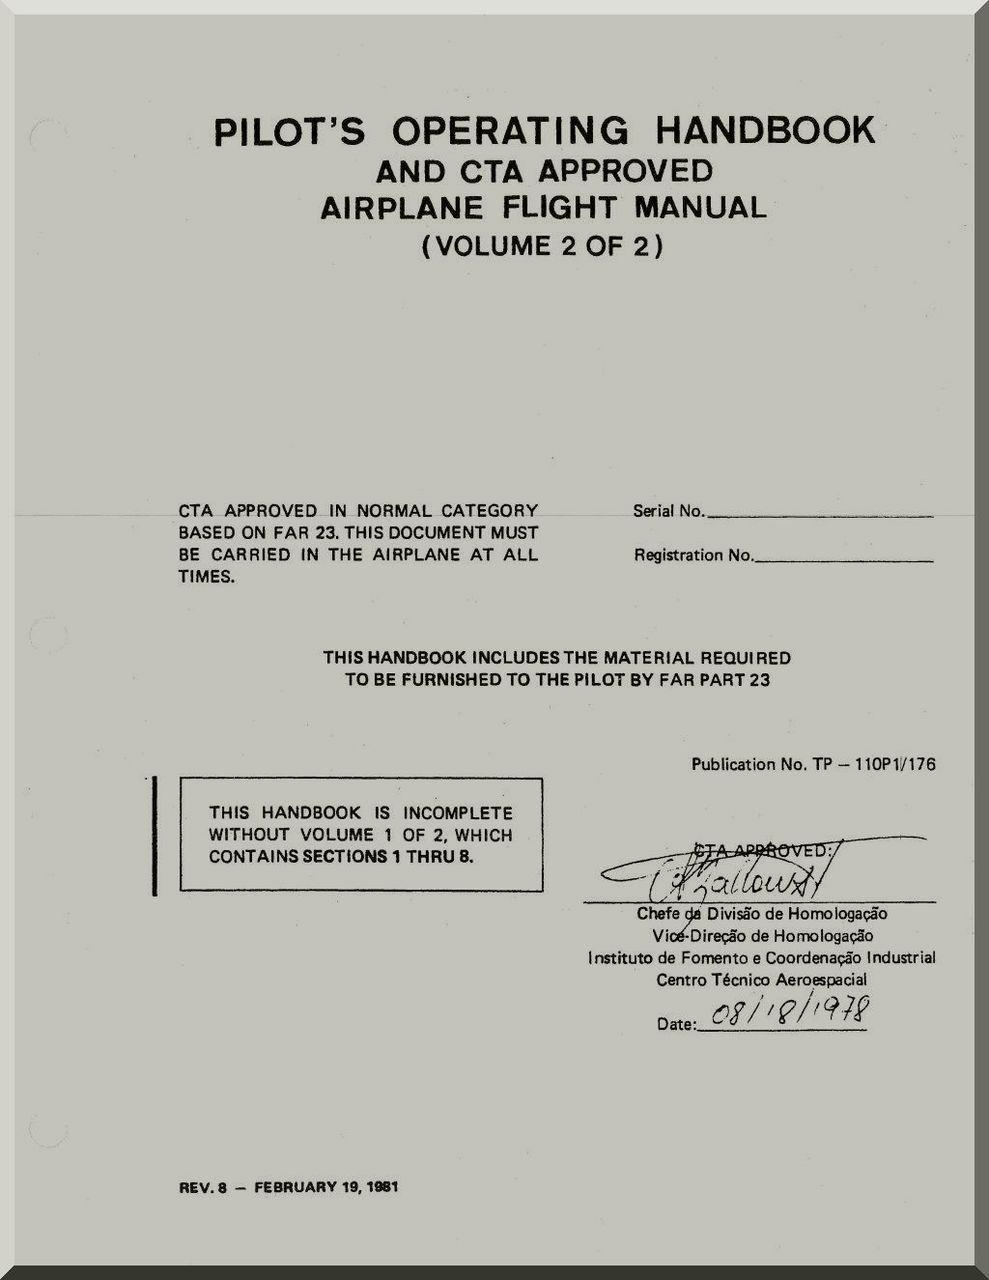 Air Pilot Manual Volume 2 Electrical Wiring Diagram For The Es10pc System Array Embraer Emb 110 Aircraft Flight Operating Hanadbook Rh Pinterest